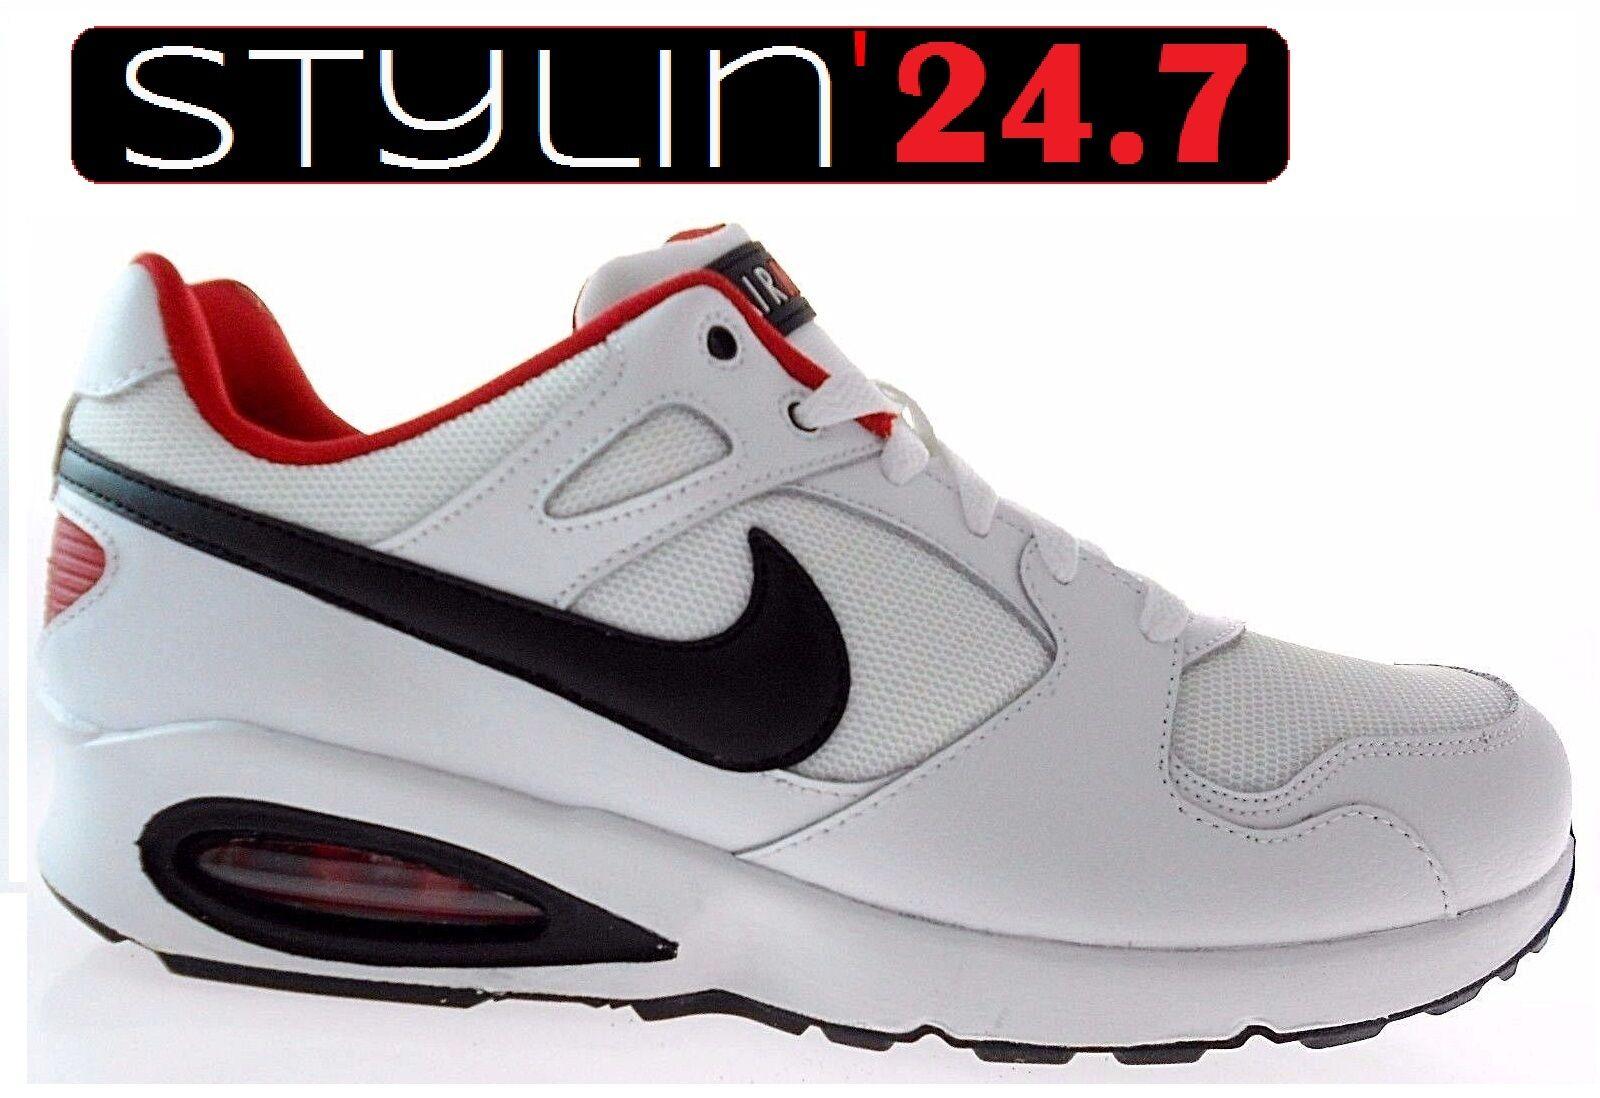 NIKE AIR MAX COLLISEUM RACER Blanc/Noir/Rouge RUNNING Chaussures, 555423-102